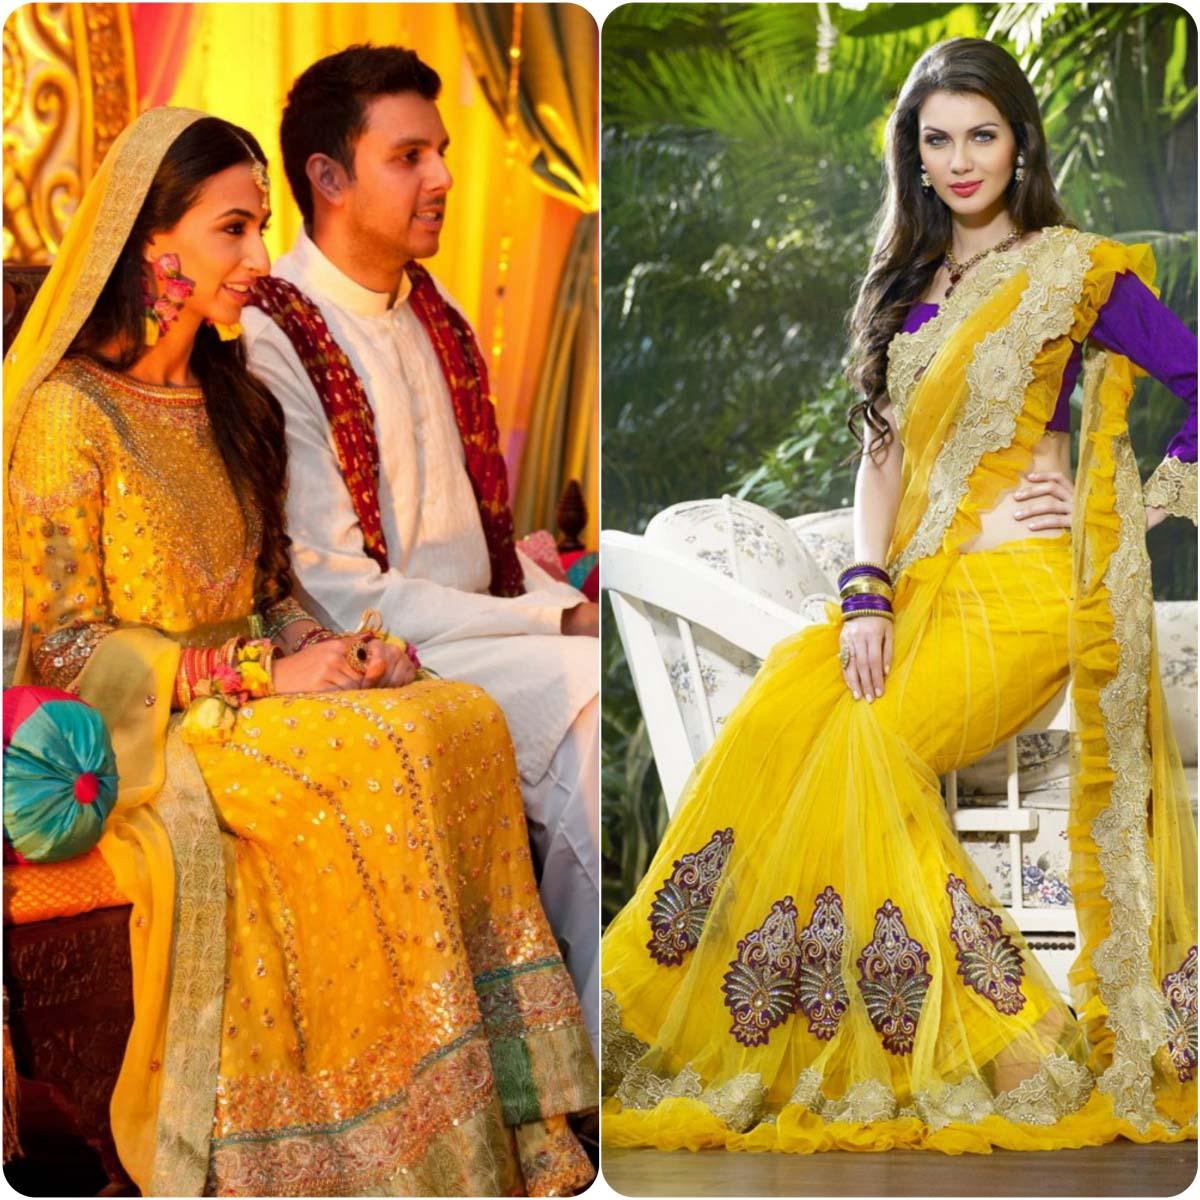 Beautiful Yellow Mehndi Dresses for Wedding Brides 2016-2017 (14)